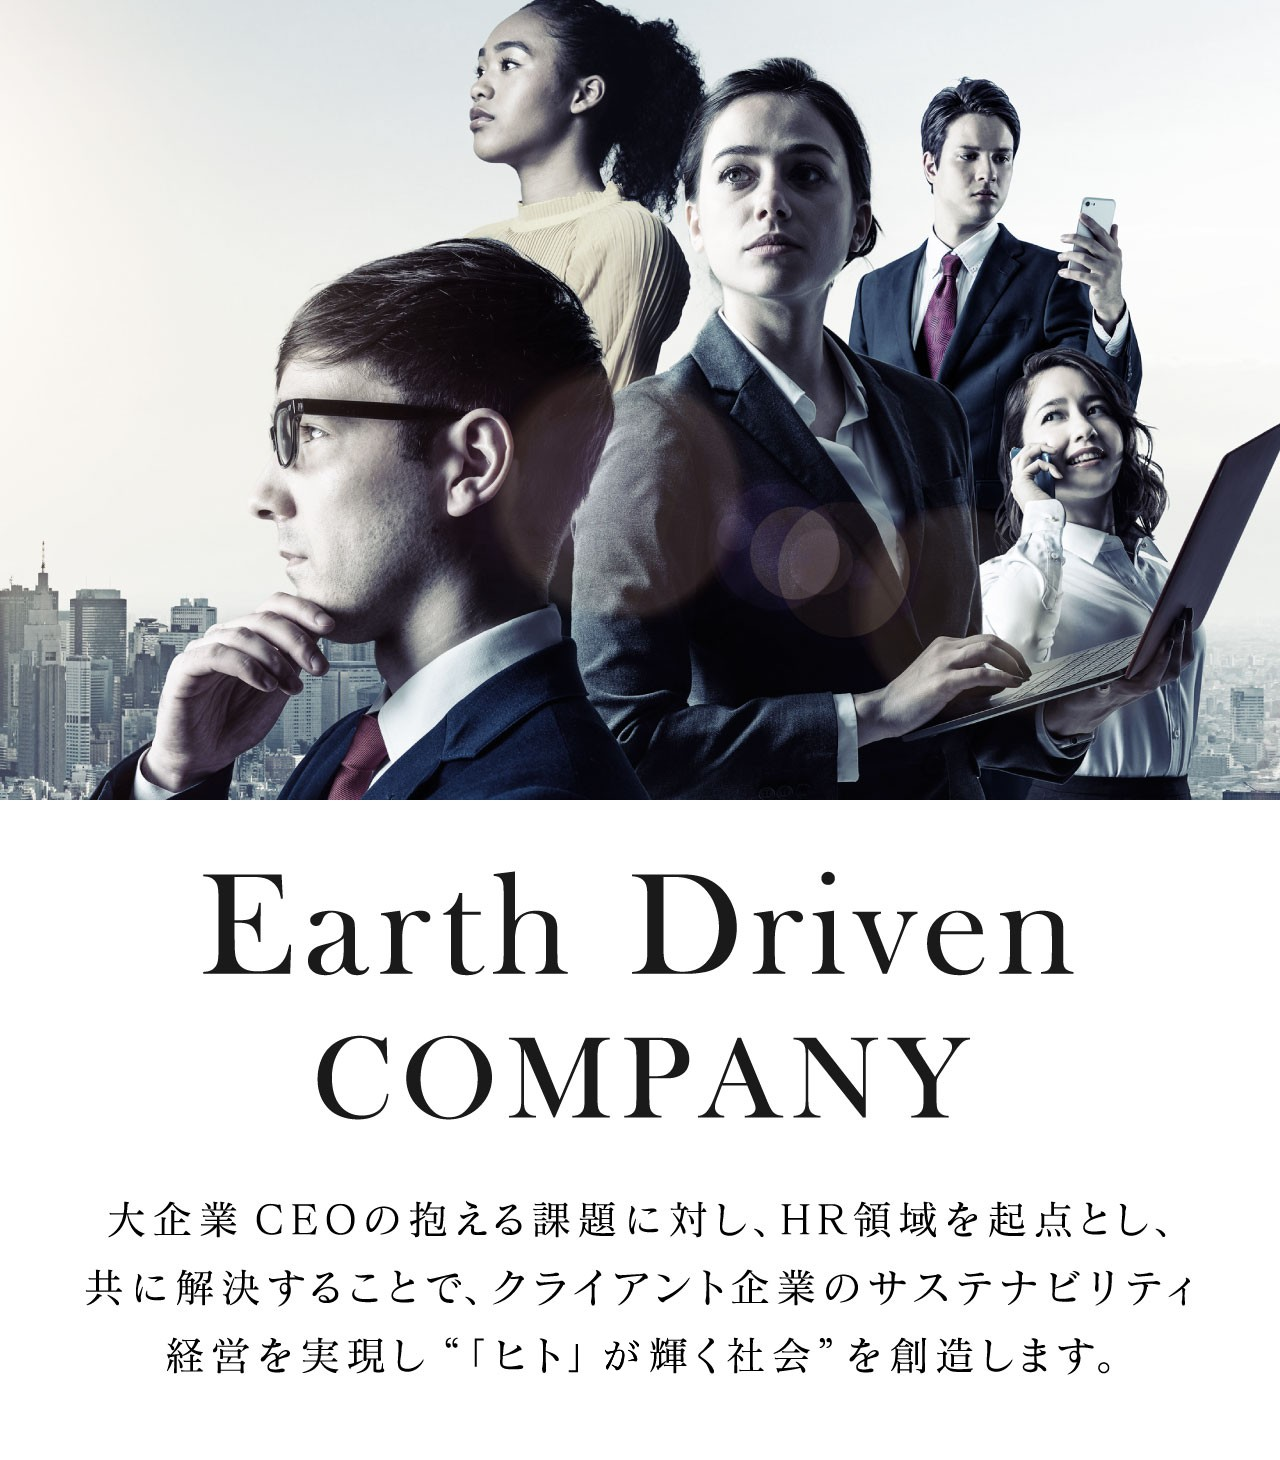 Earth Driven COMPANY